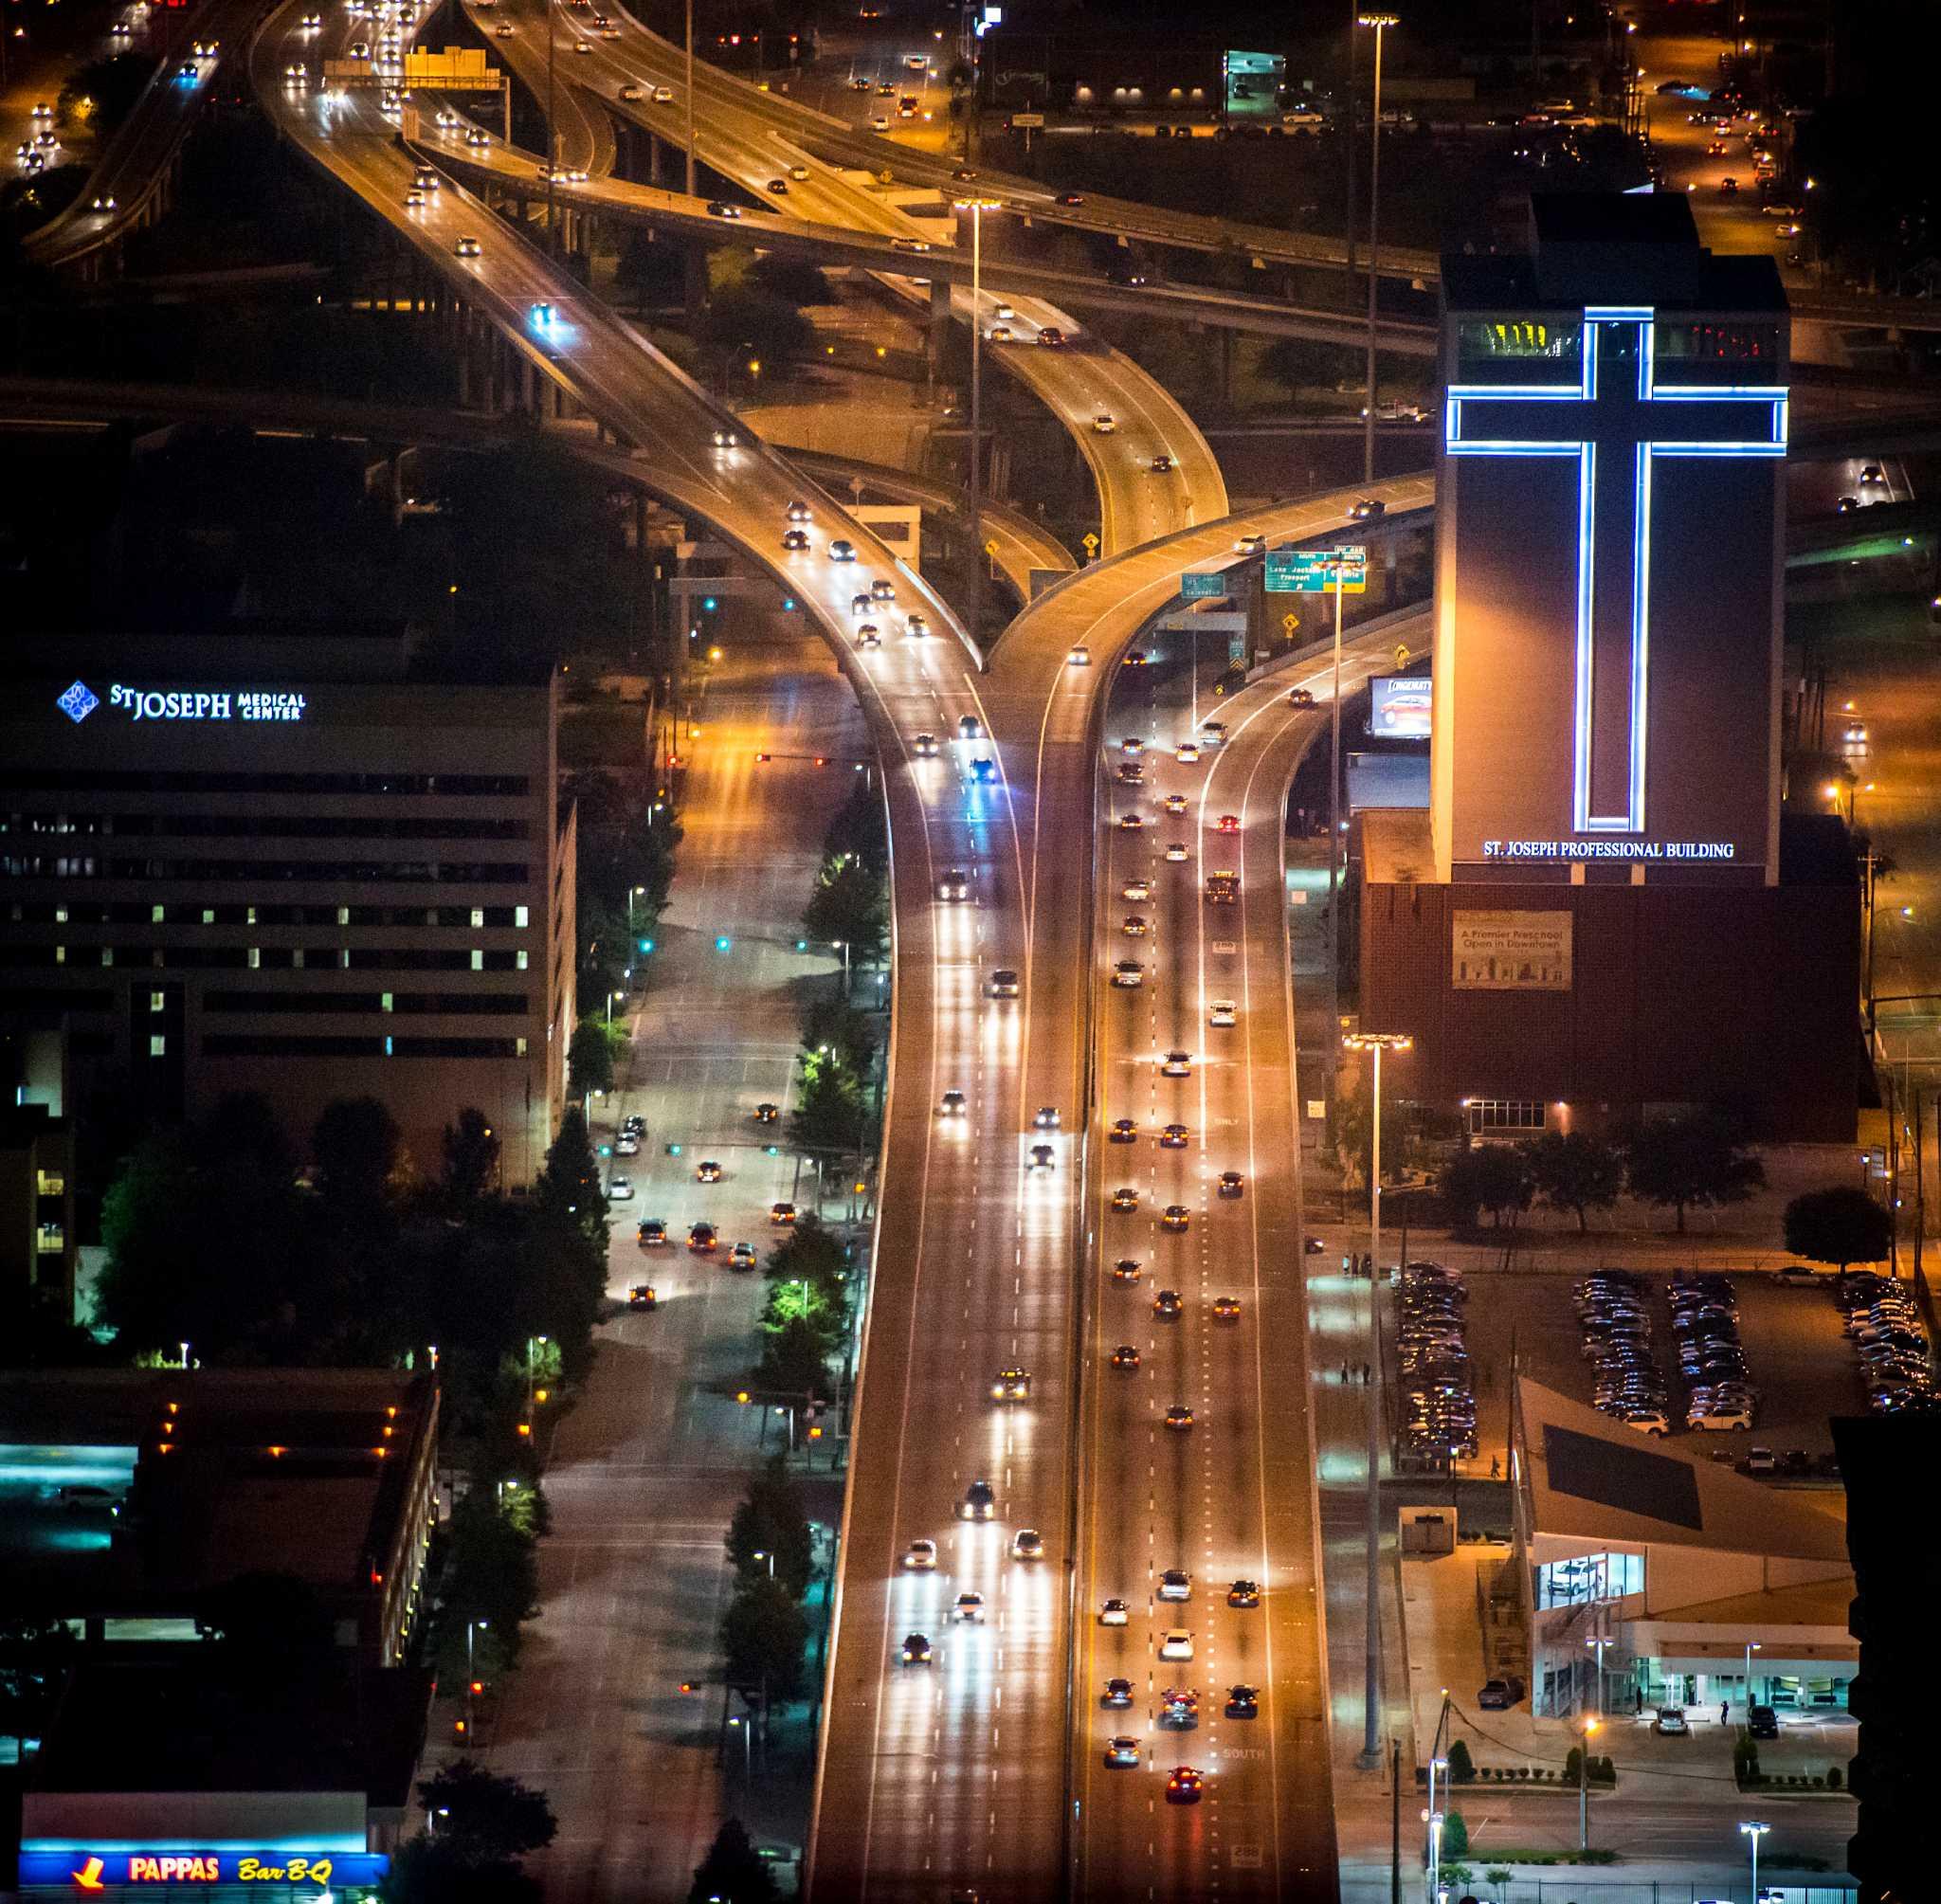 TxDOT considering options for widening I-45 - HoustonChronicle.com